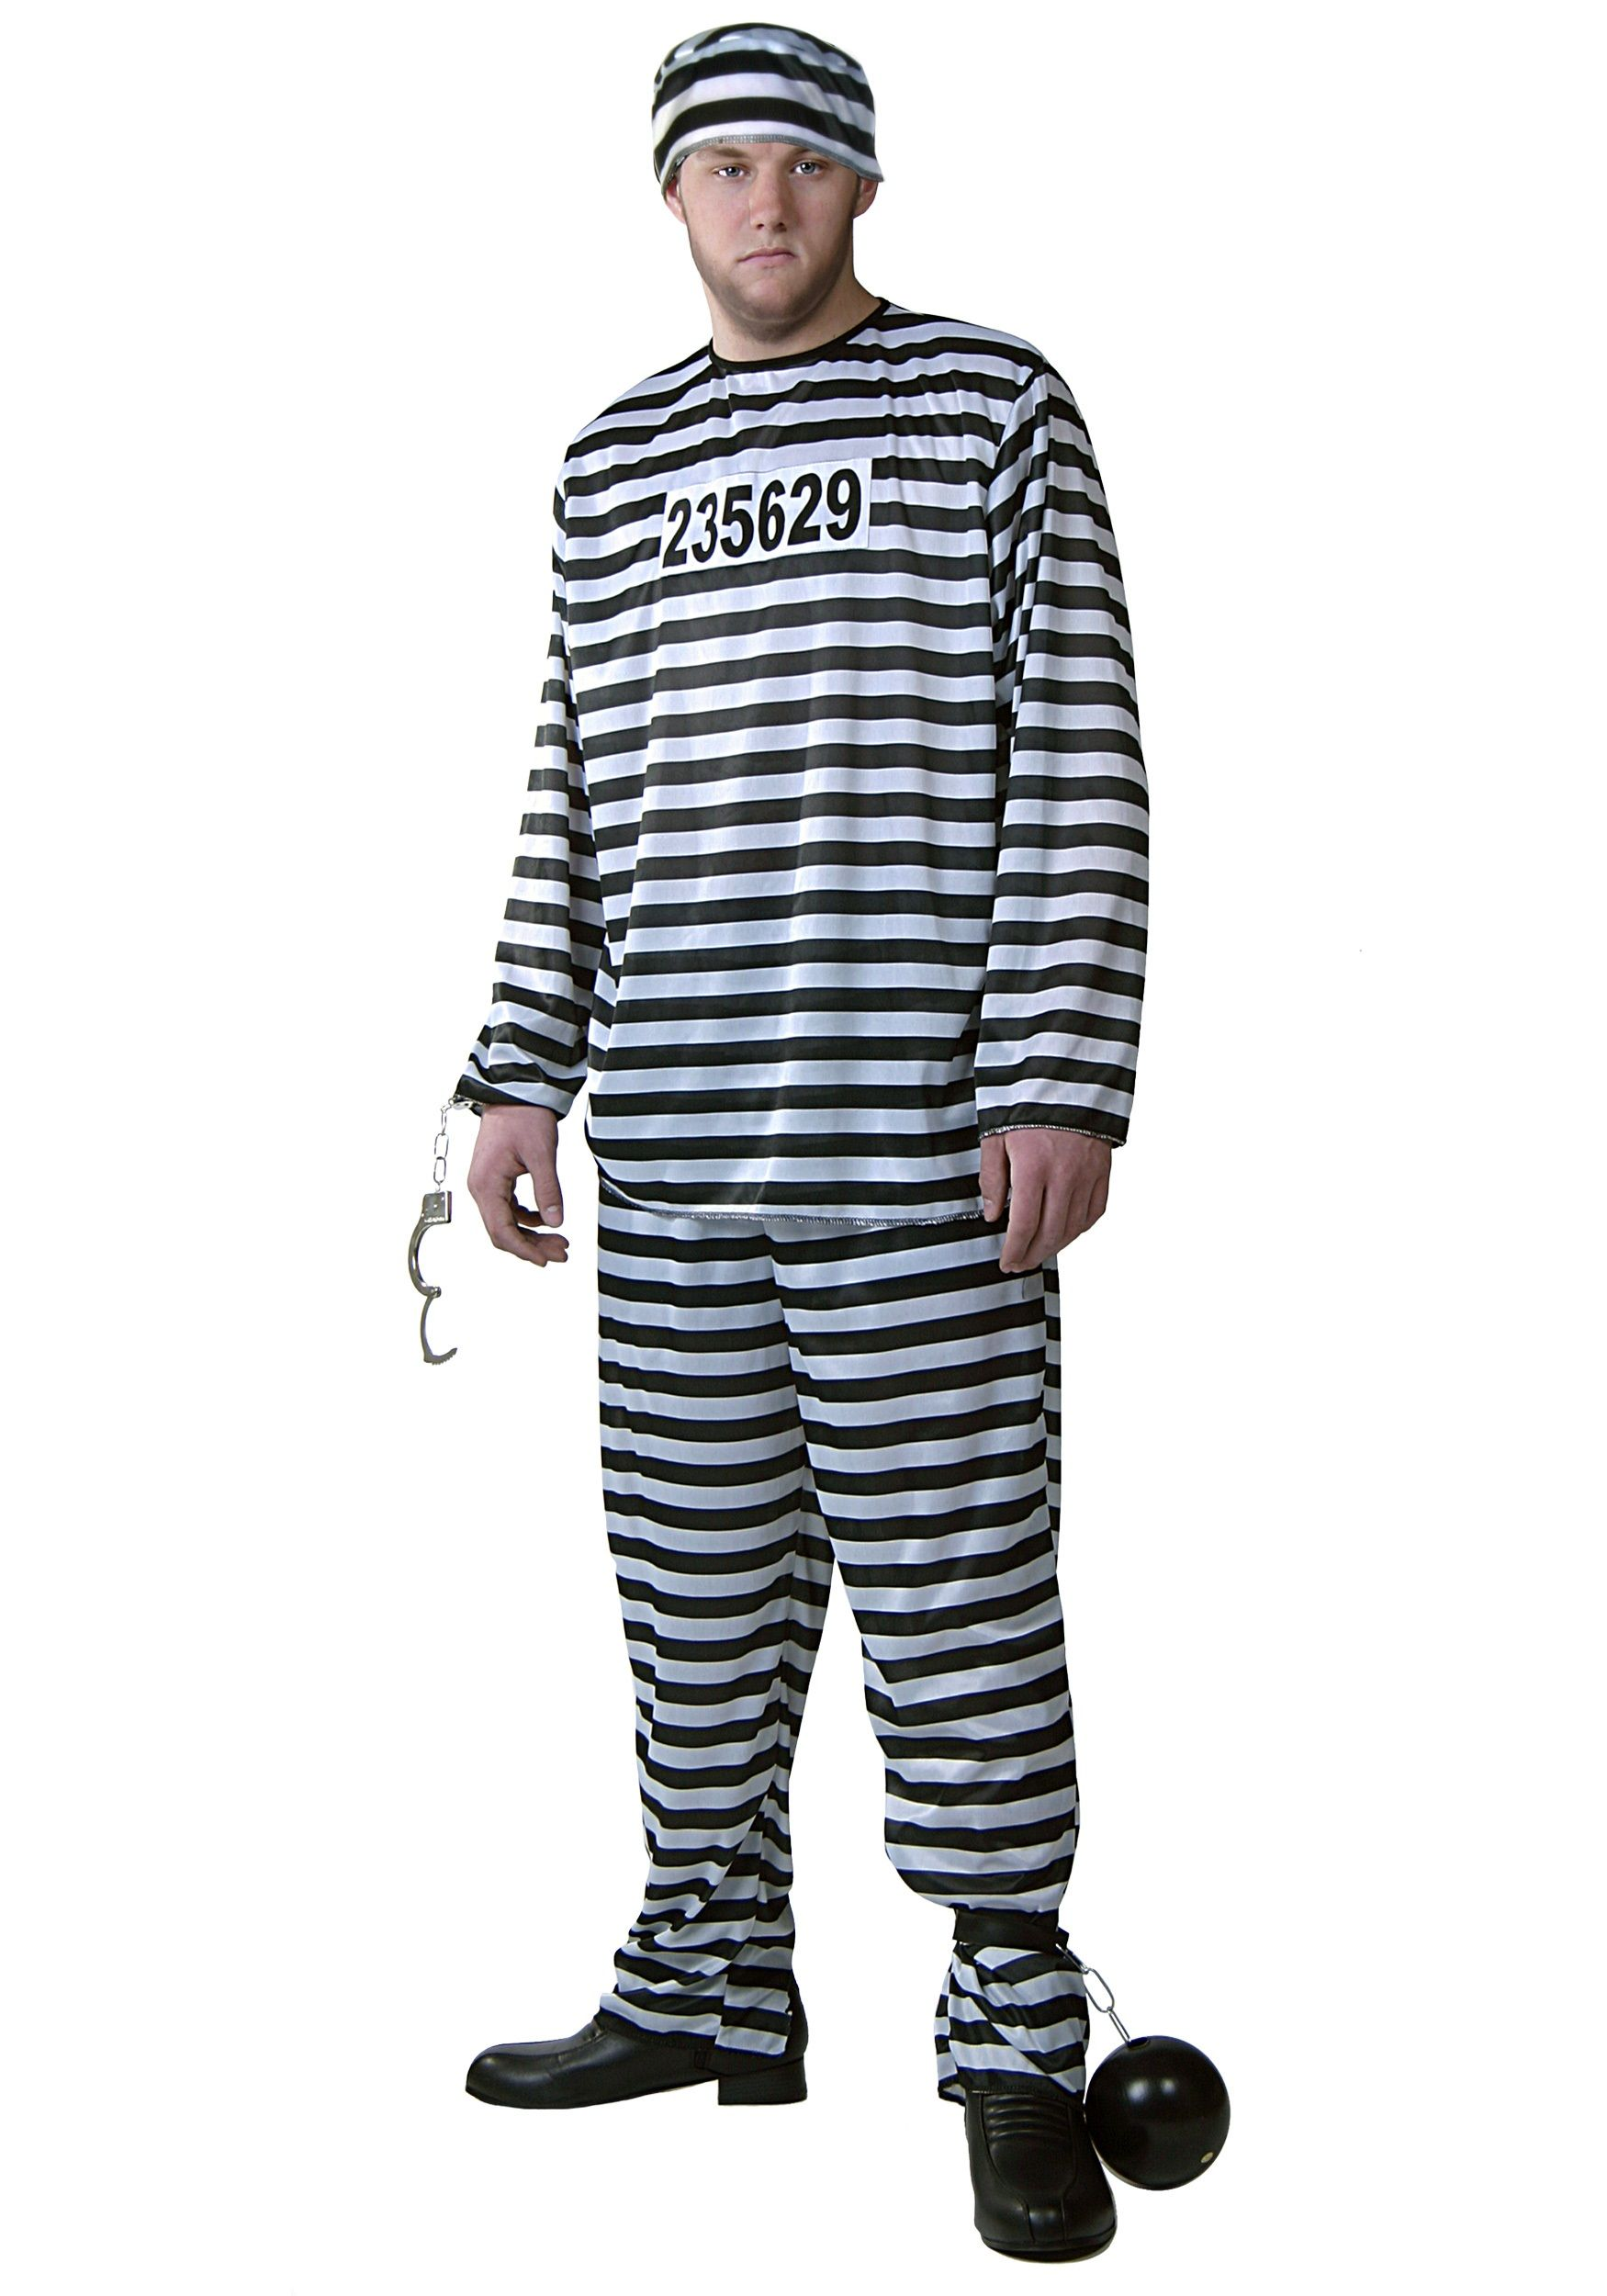 Plus Size Men's Prisoner Costume | Costumes and Halloween costumes